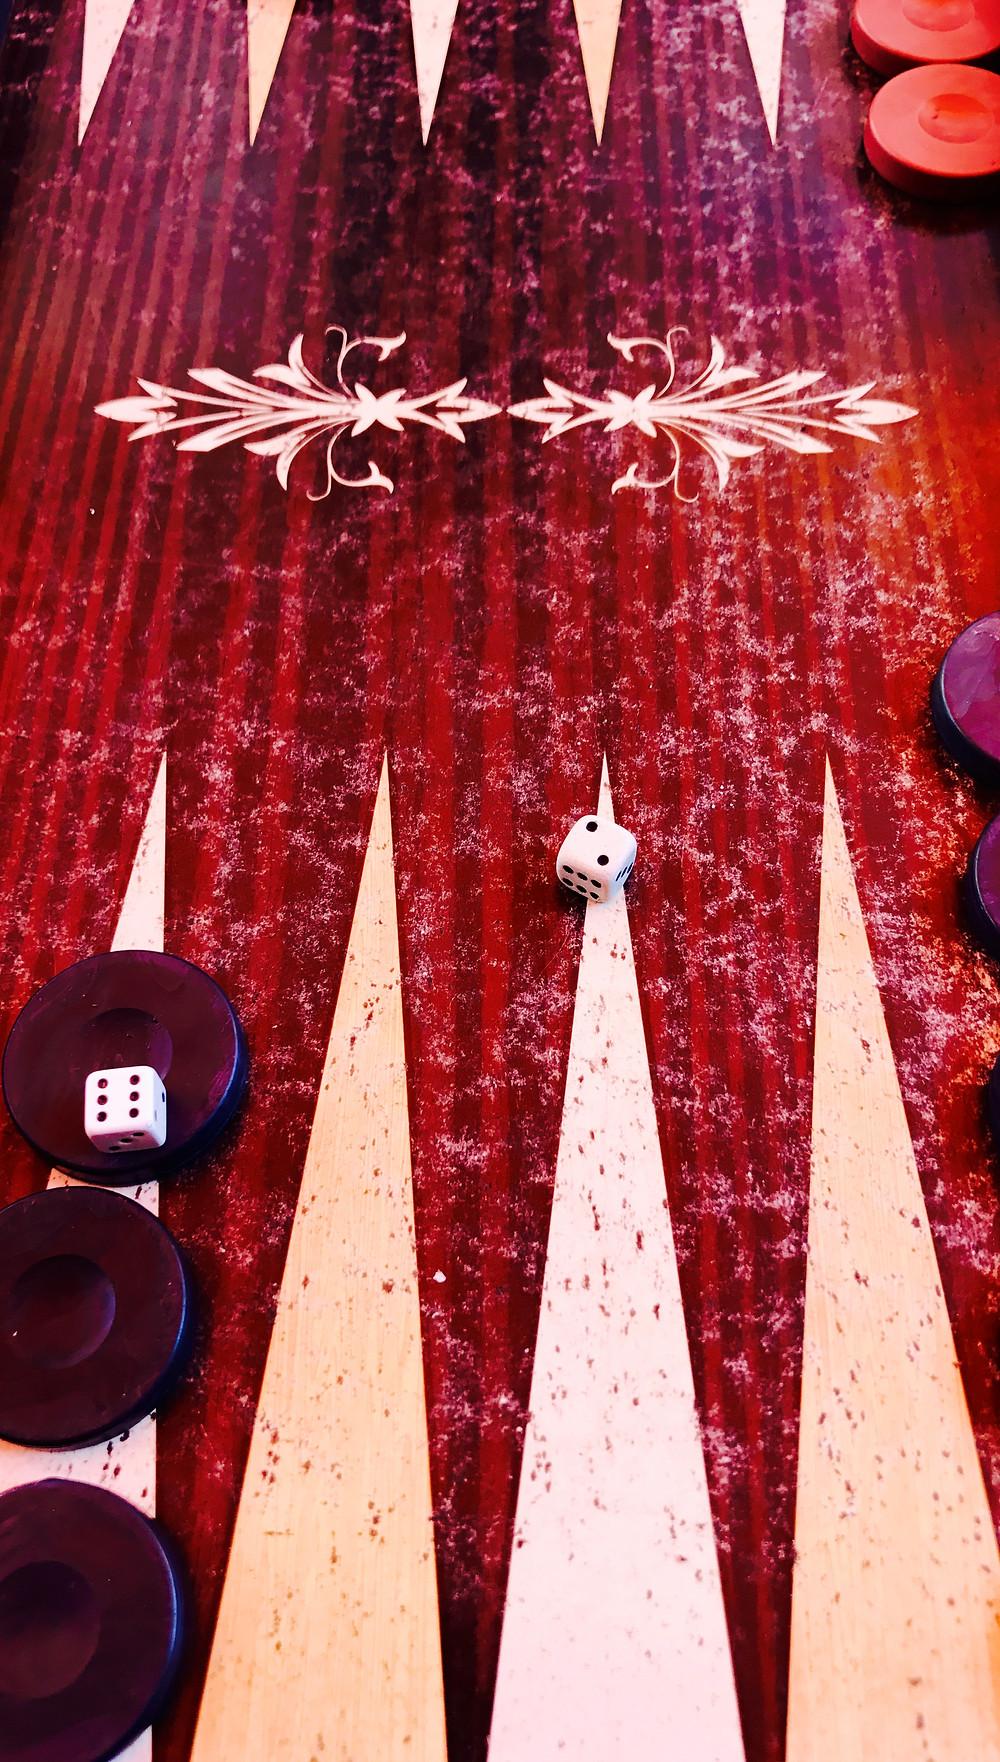 Tavla Game Board at Dede Tea House  in Çanakkale